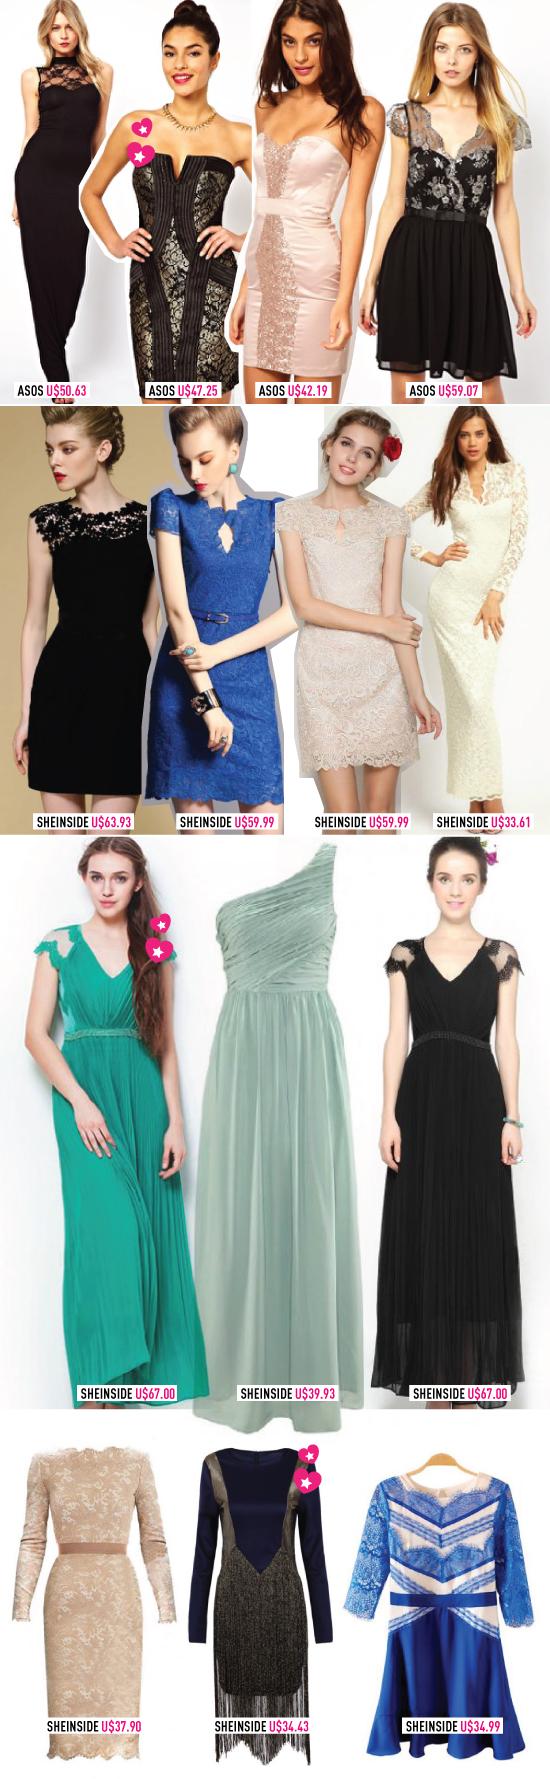 com: Modelos de vestidos de Renda Longos – Como Usar e Onde Comprar